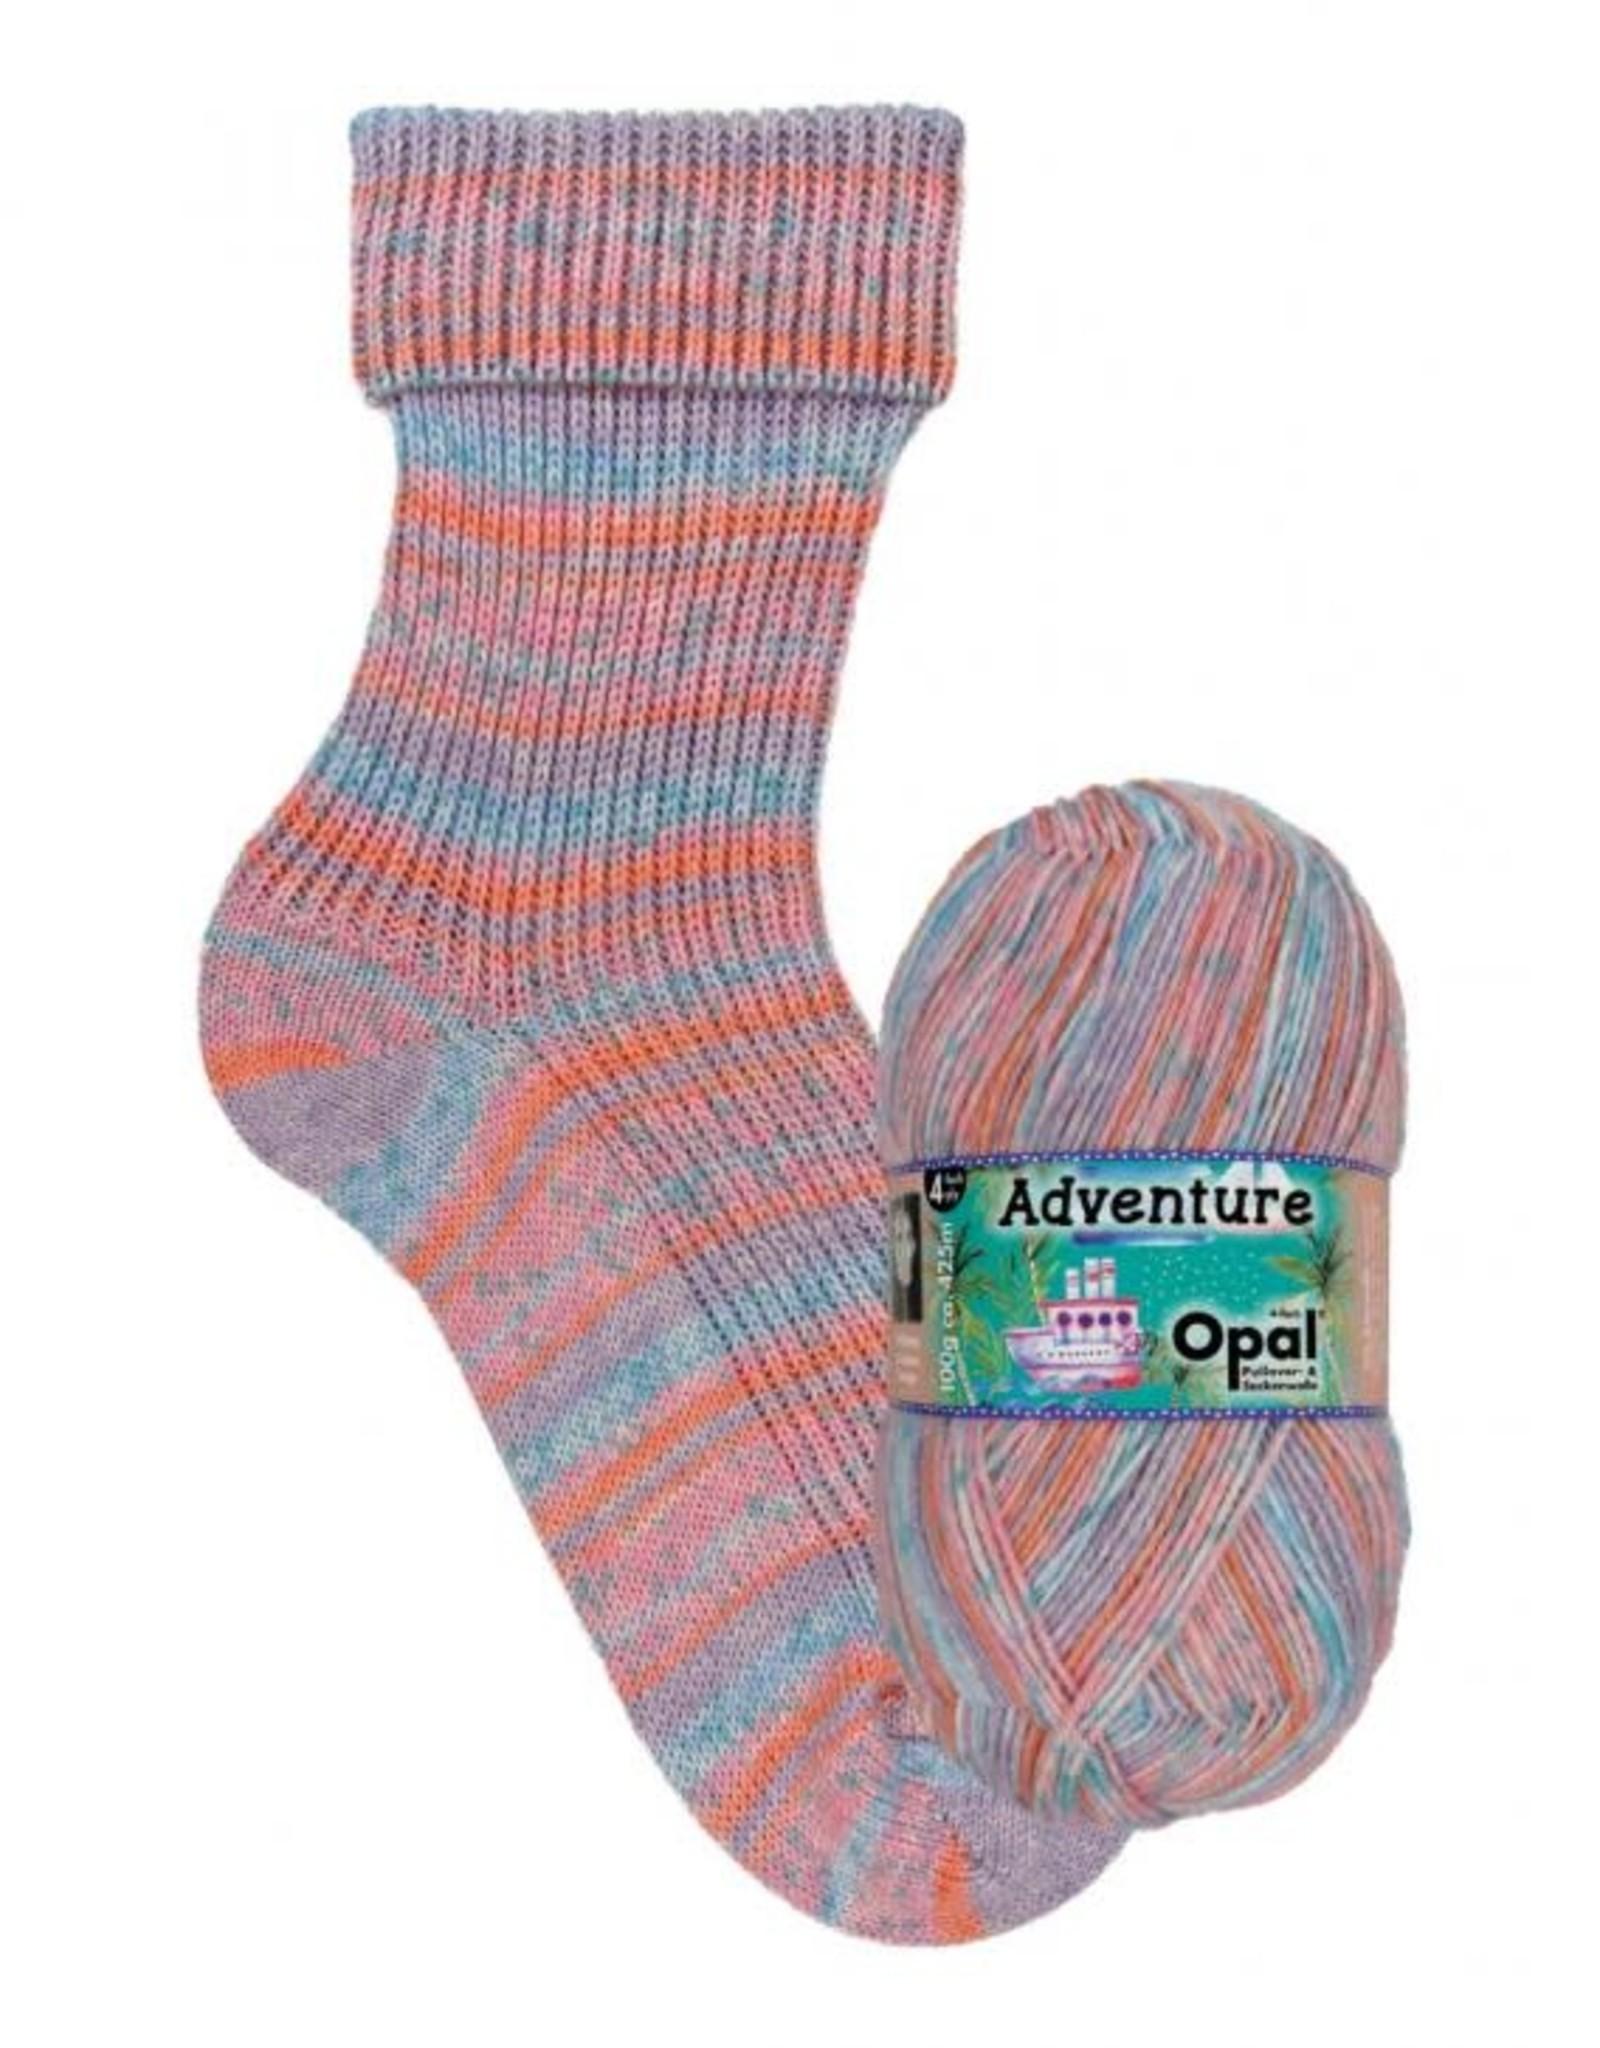 Opal - Adventure 9822